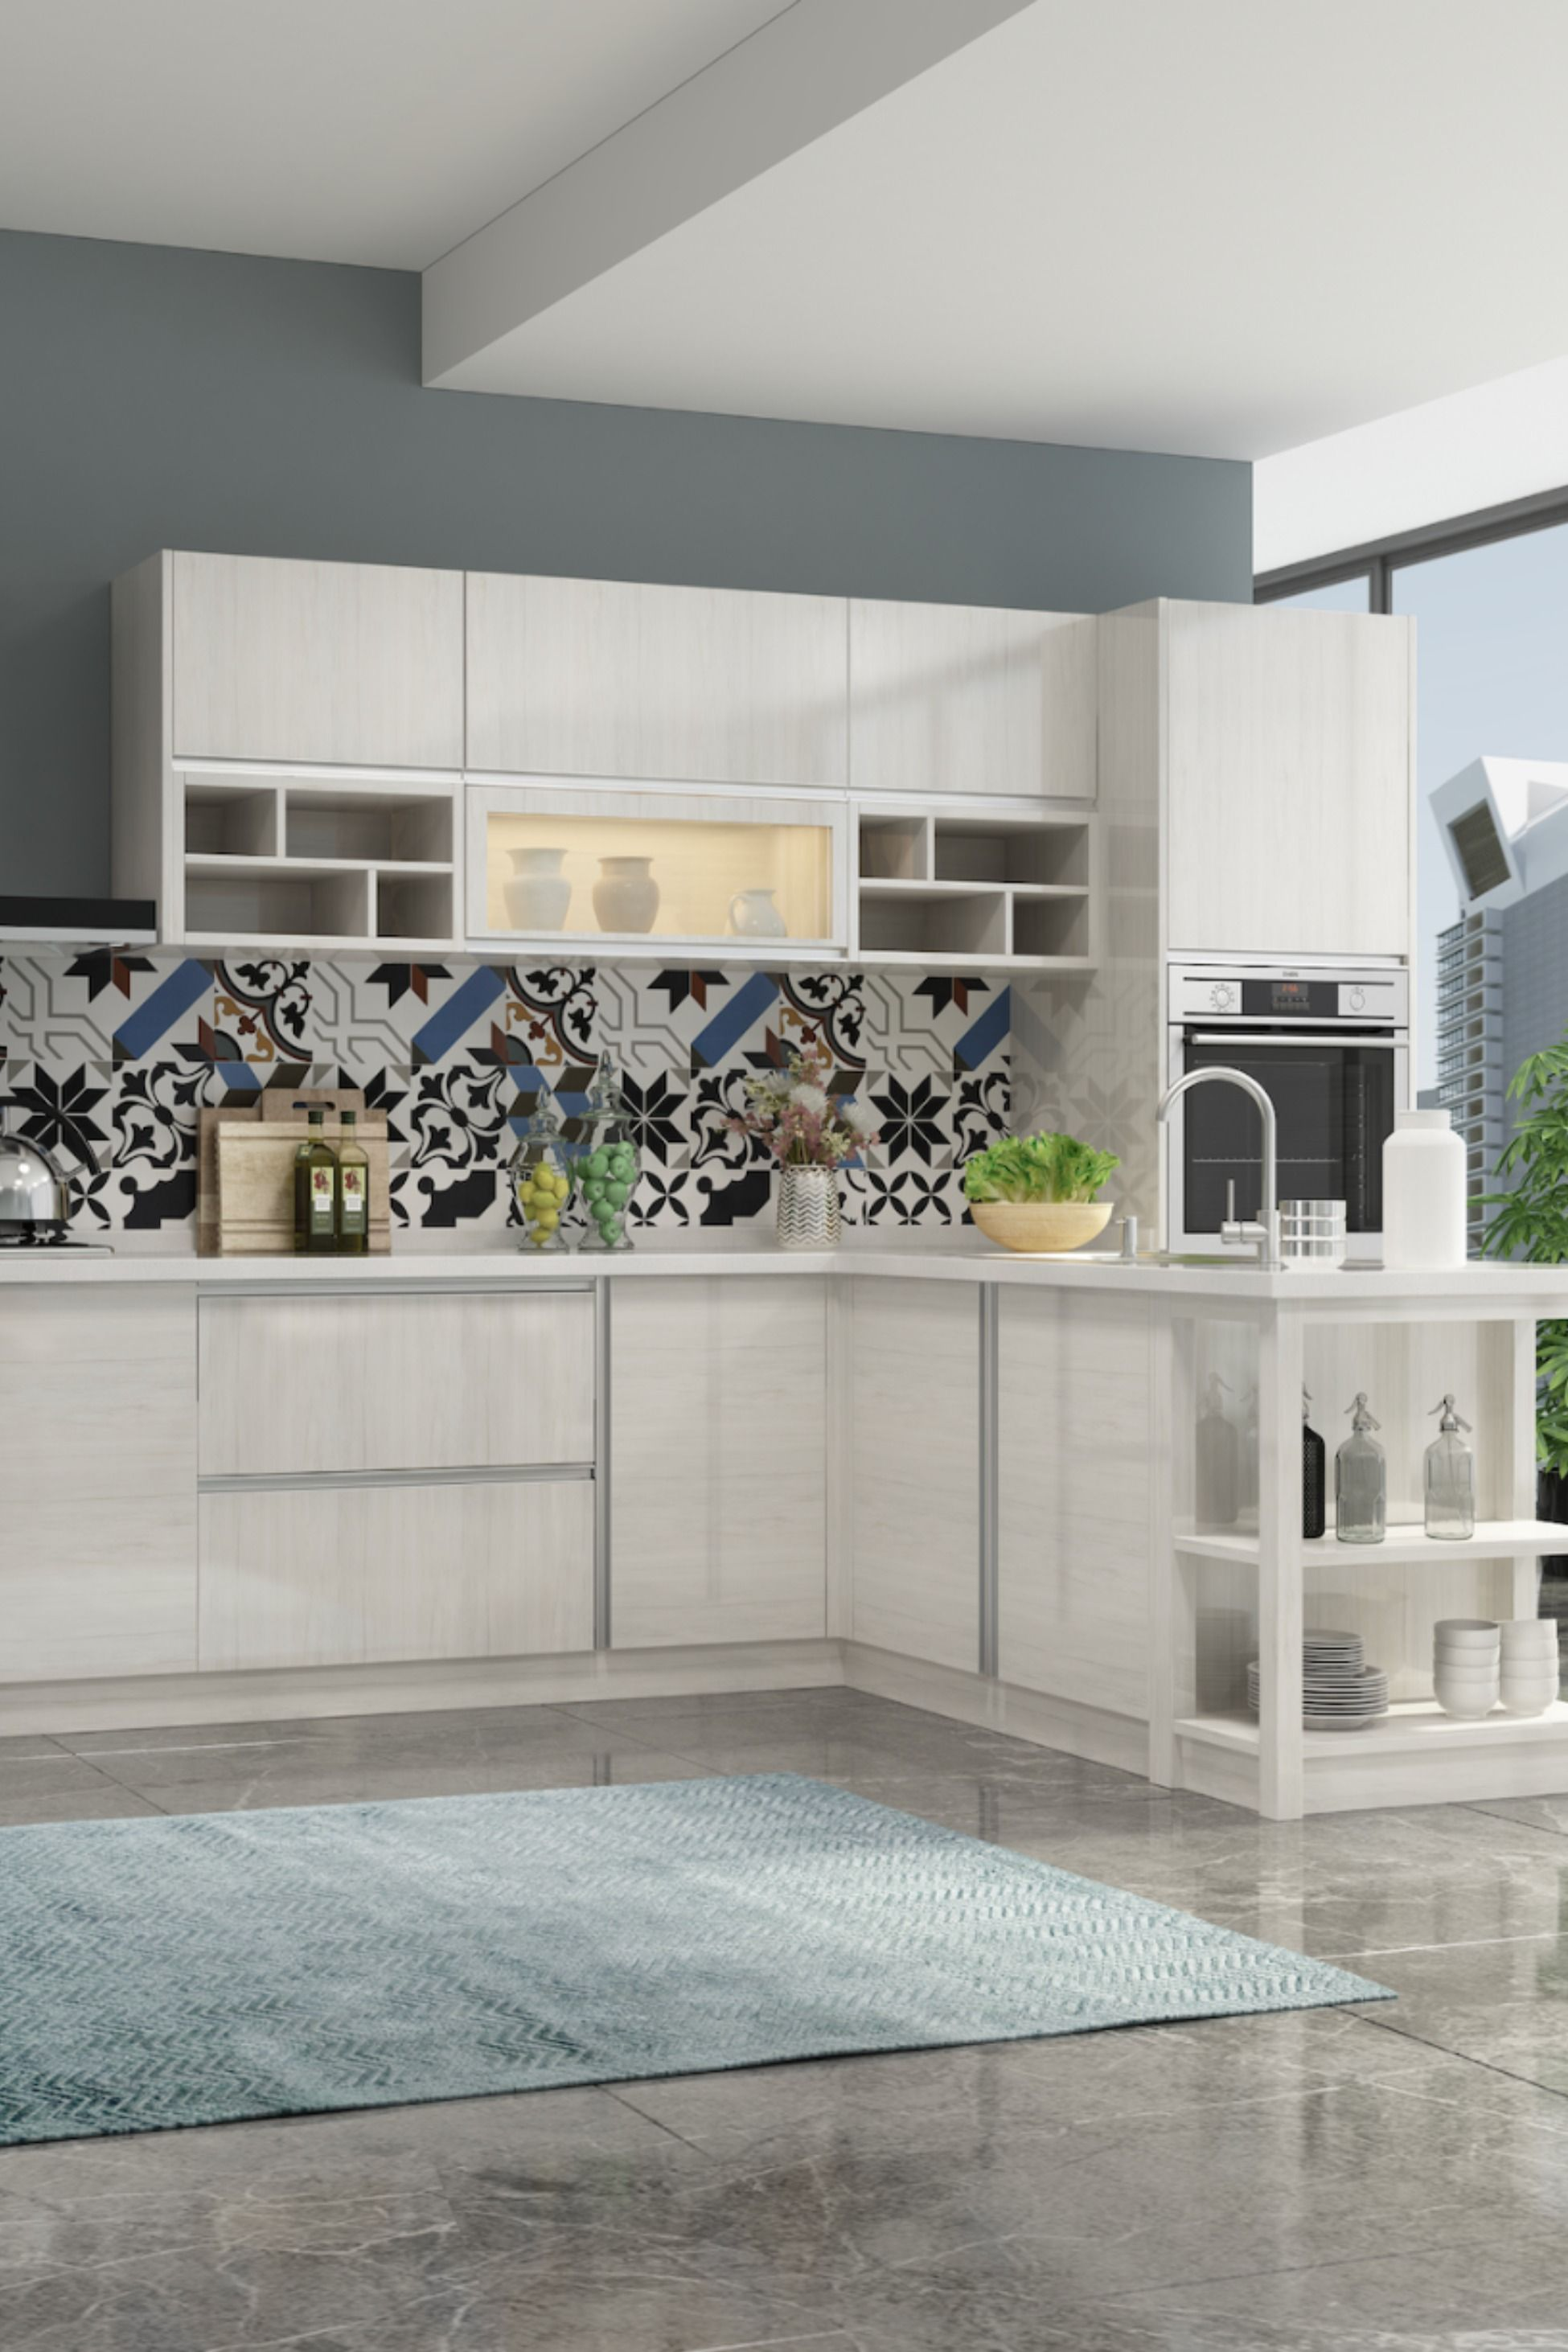 White Kitchen Cabinets In 2020 Kitchen Cabinets White Kitchen Cabinets Kitchen Cabinet Colors